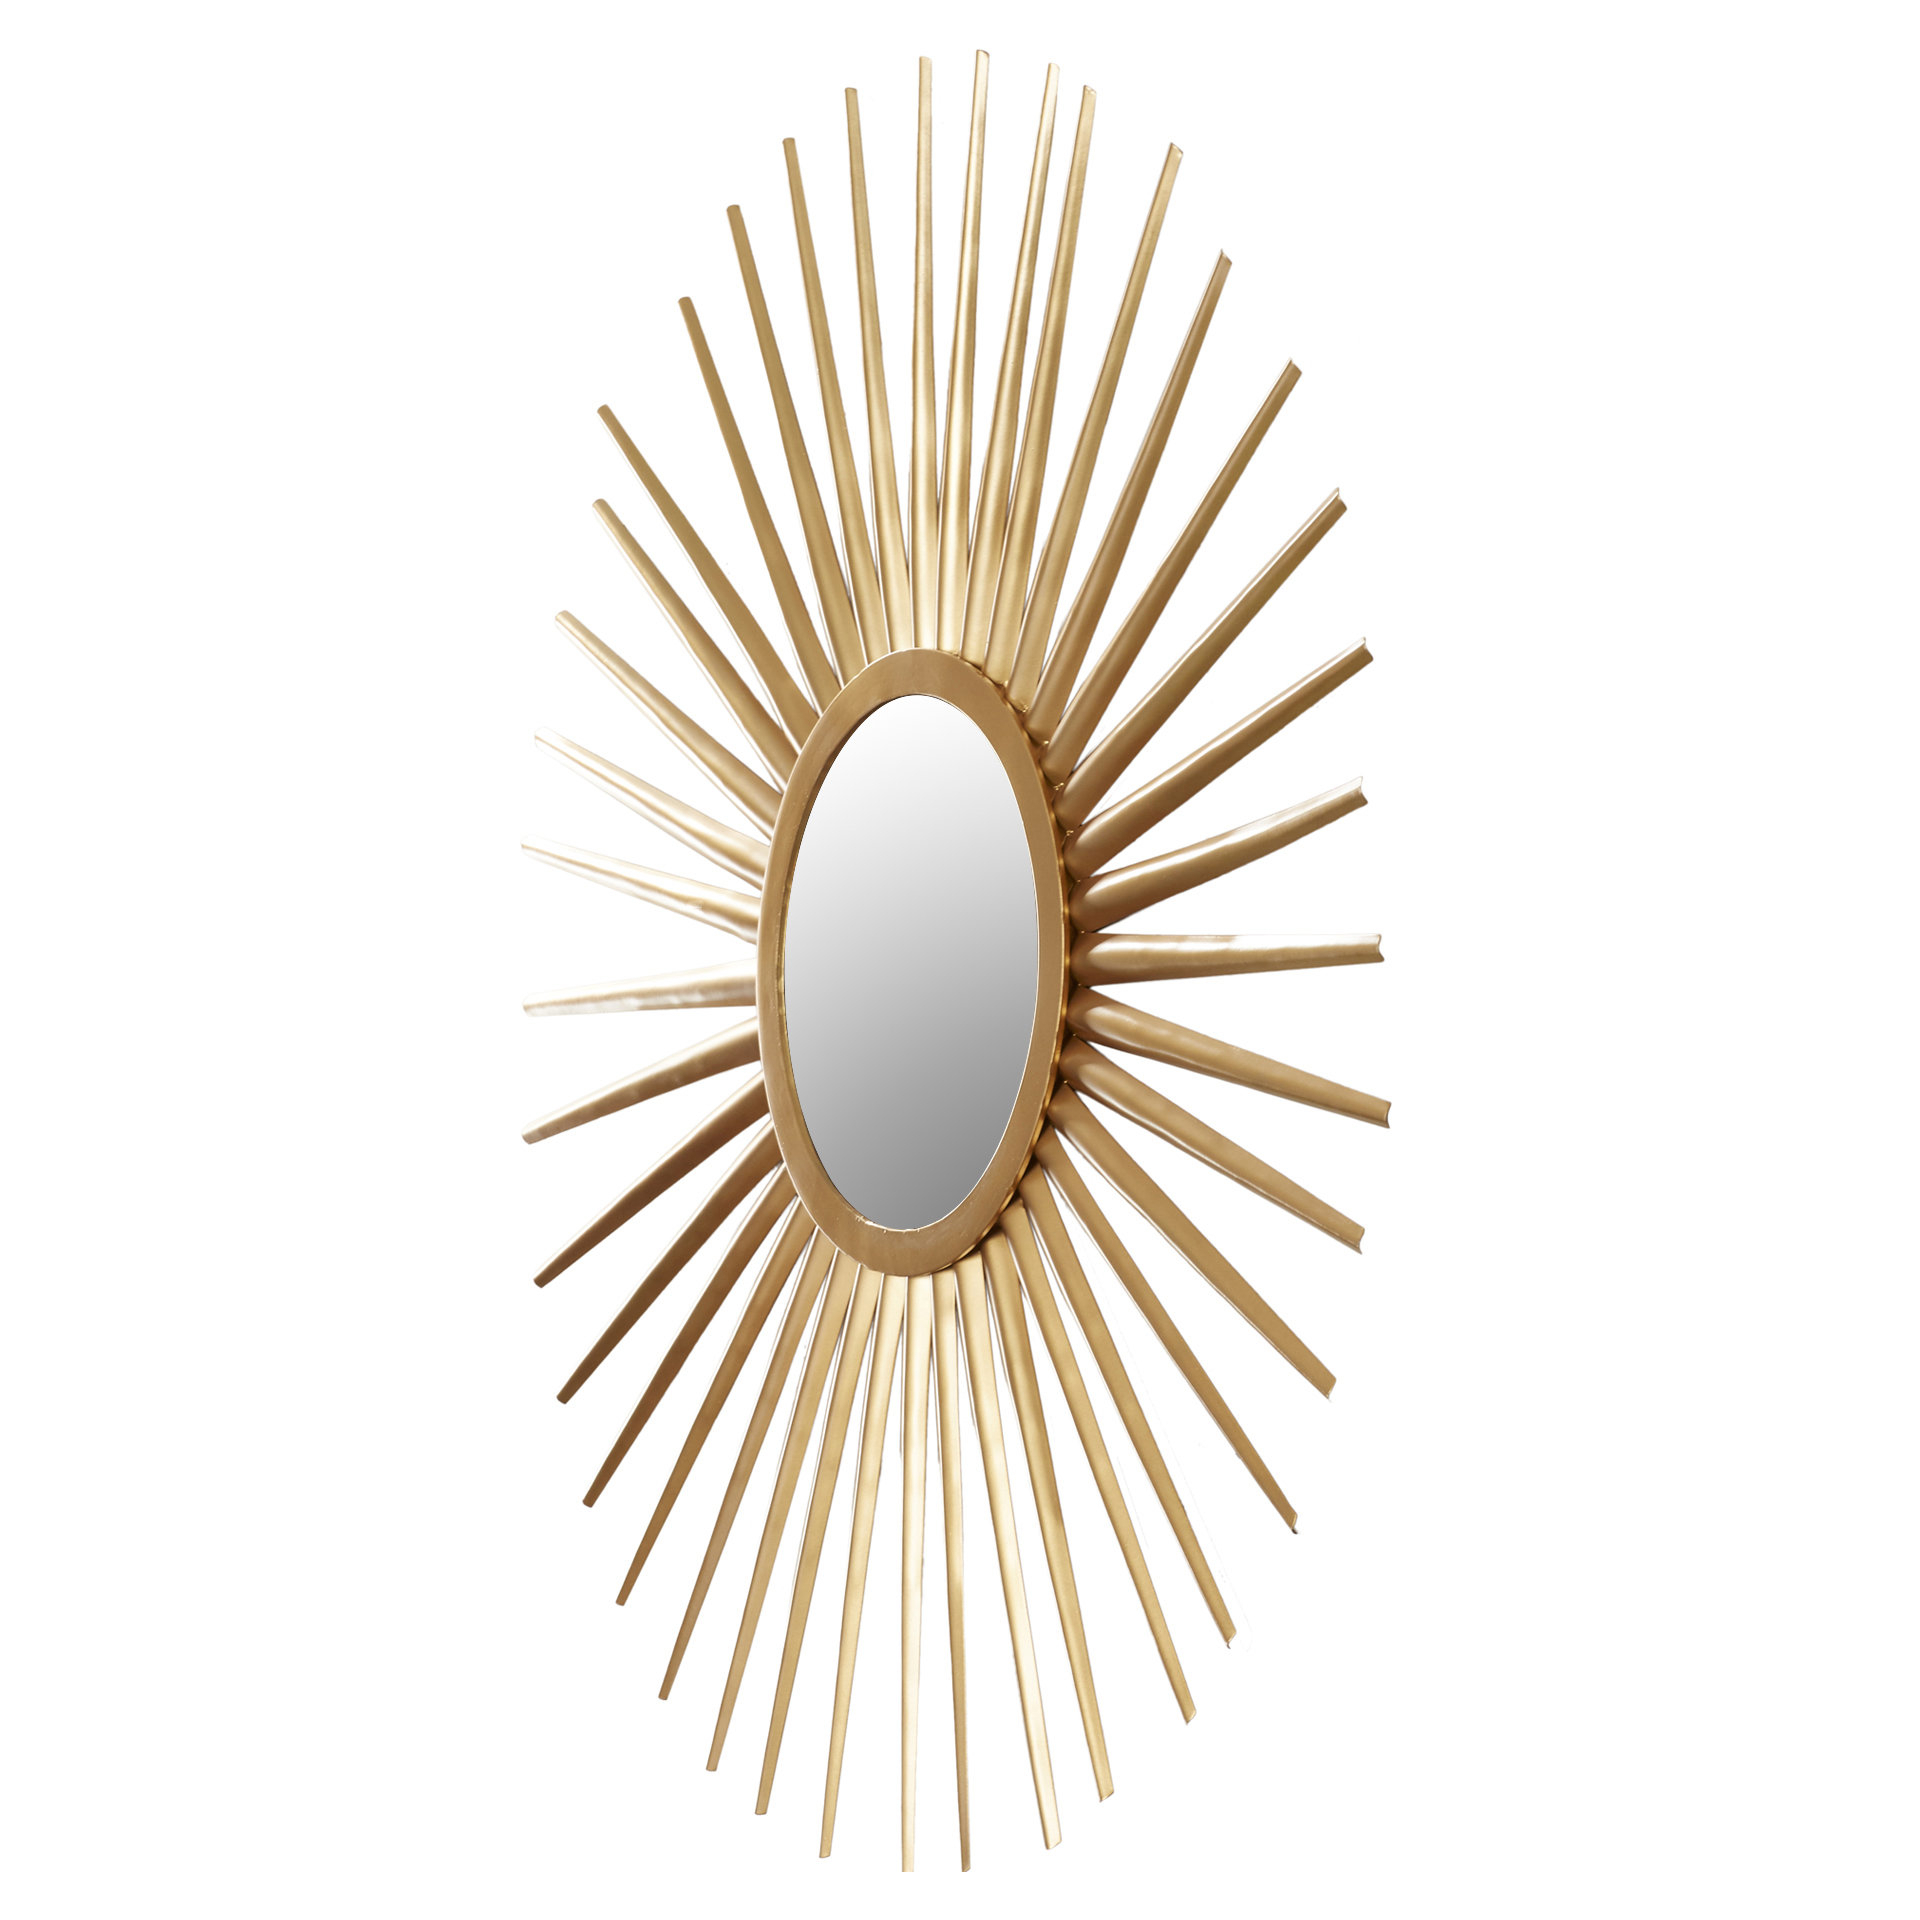 Sunburst Wall Mirror With Regard To Most Current Birksgate Sunburst Accent Mirrors (View 12 of 20)